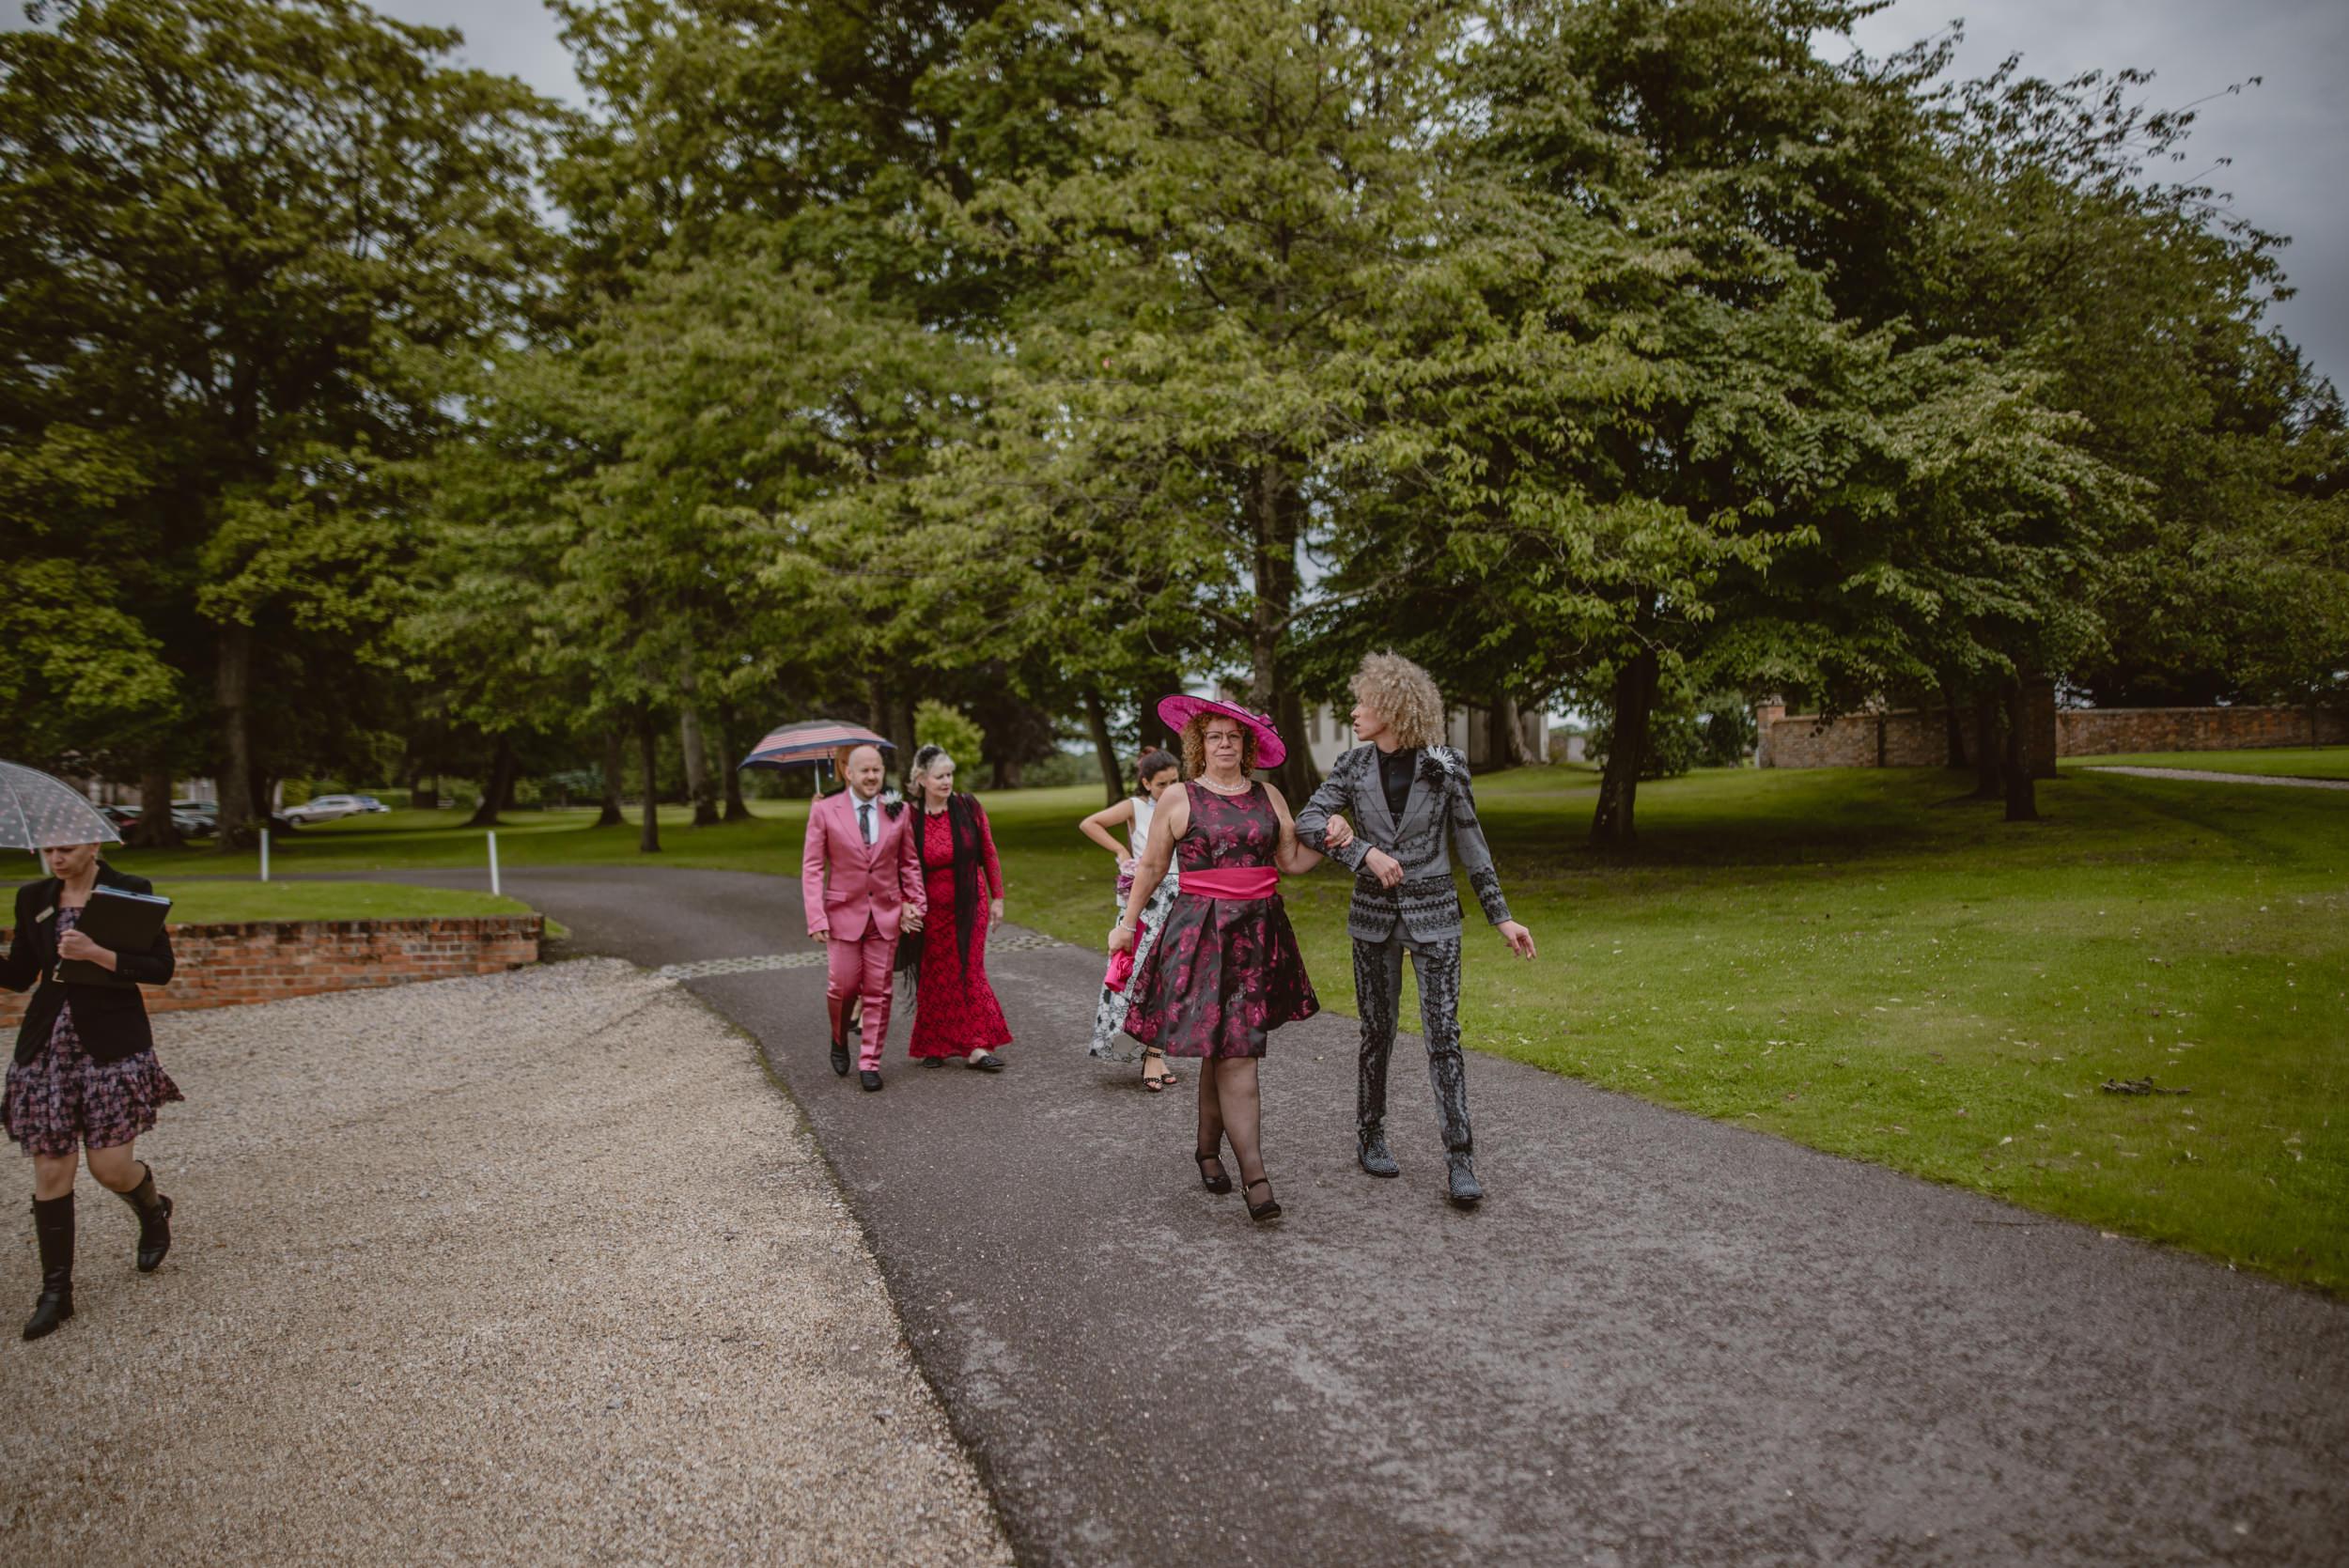 Barry-and-Chaz-wedding-Wasing-Park-Berkshire-Manu-Mendoza-Wedding-Photography-156.jpg